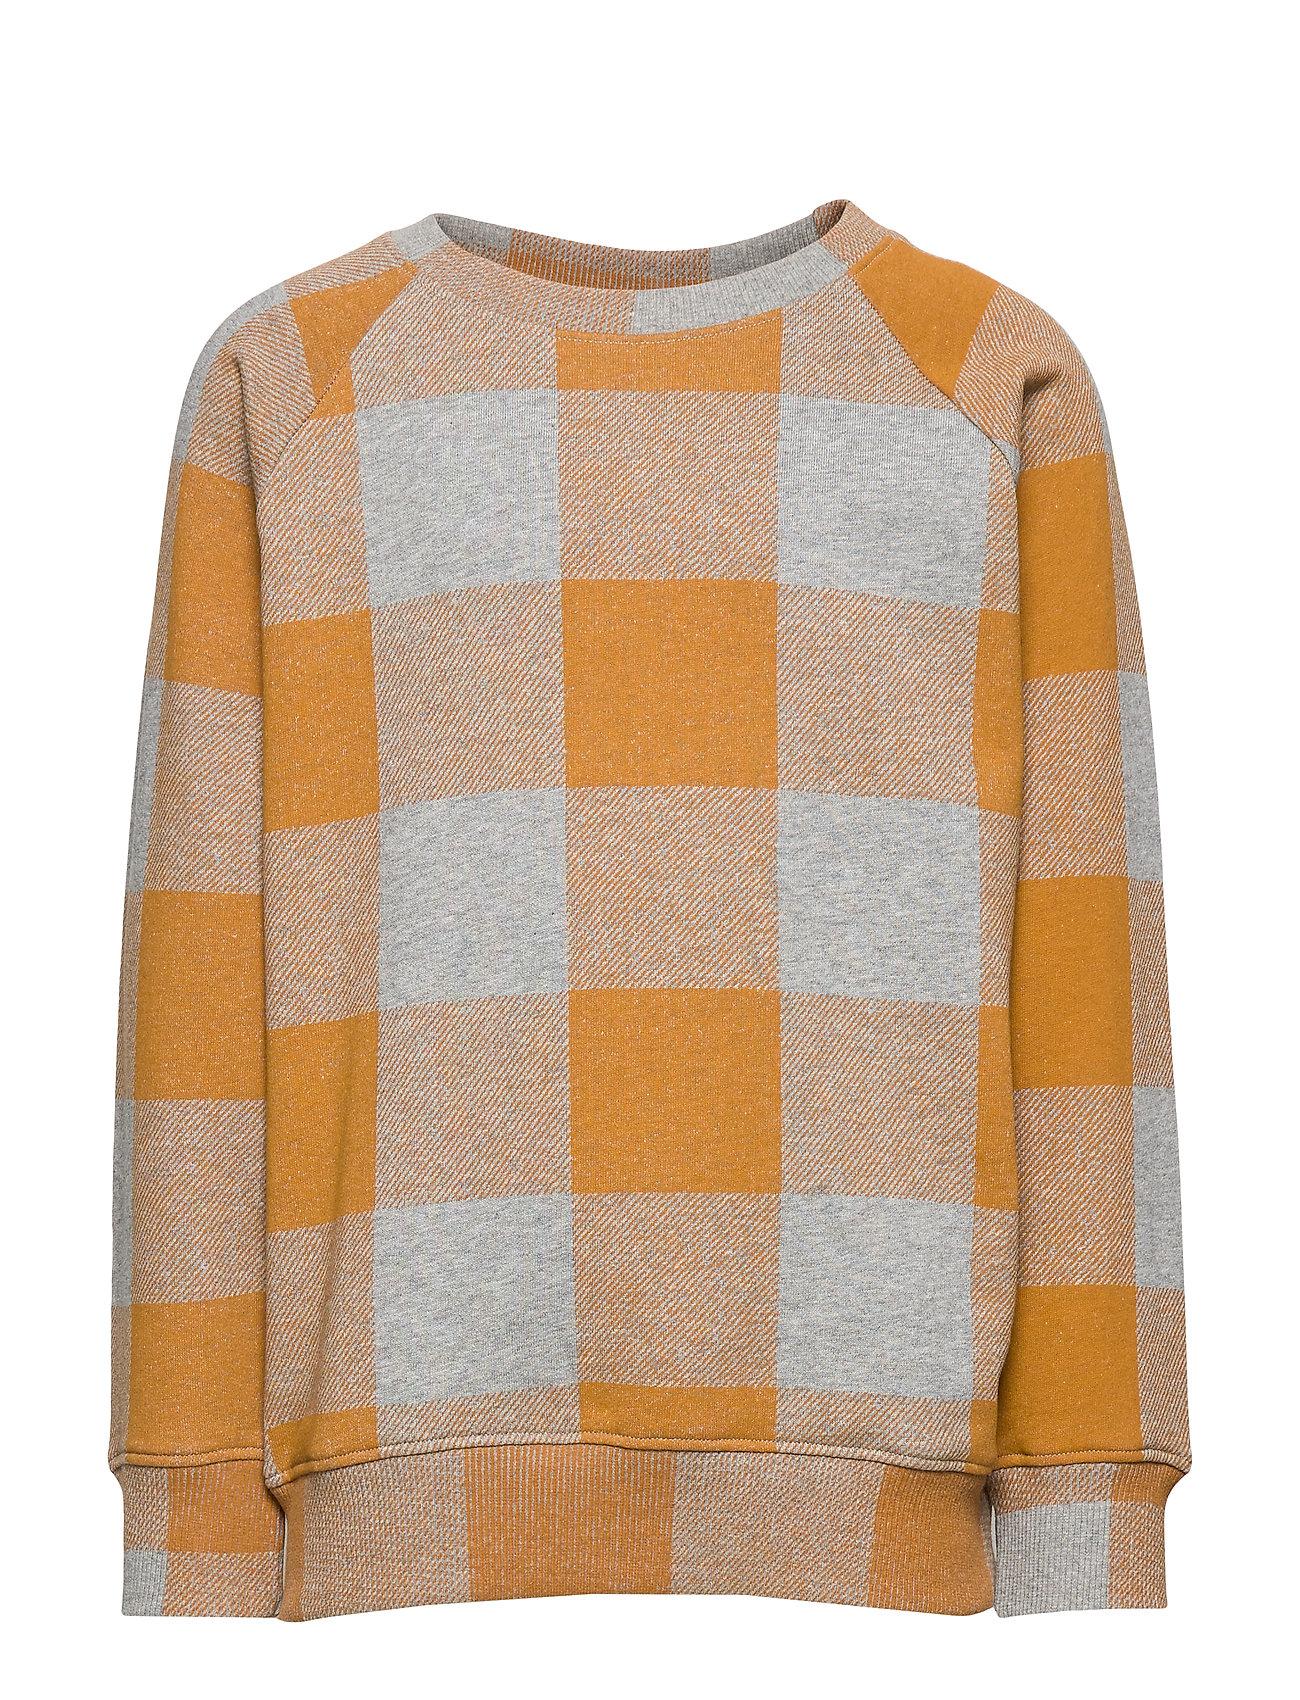 Soft Gallery Chaz Sweatshirt - GREY MELANGE, AOP PLAID